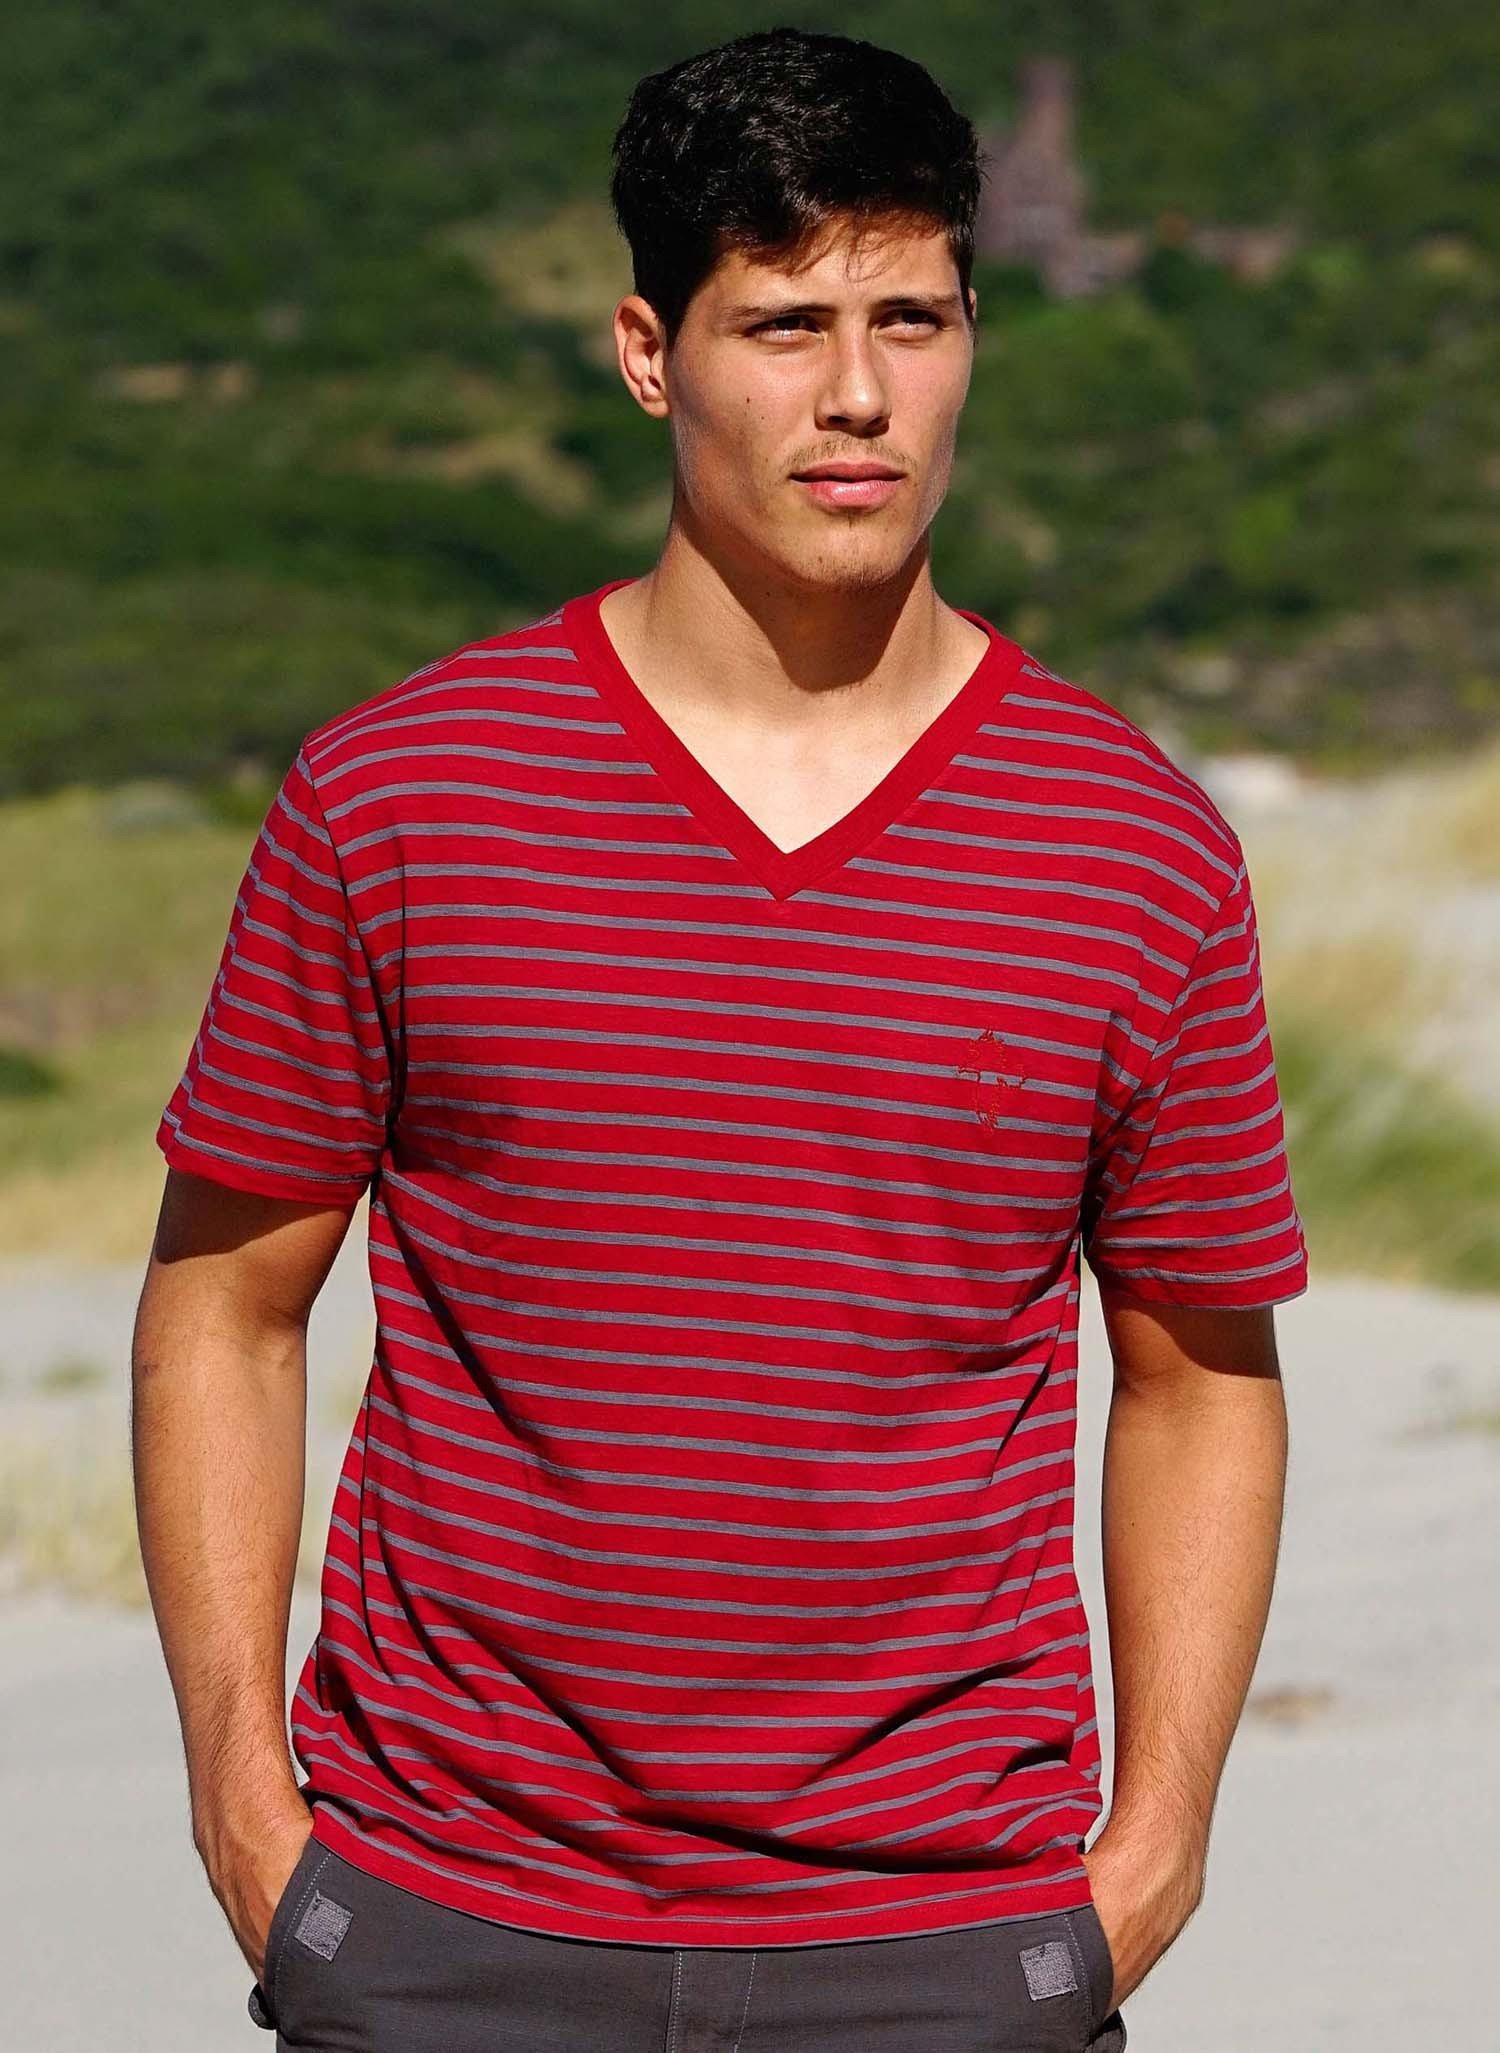 H-KA-Shirt,V-Auss rot/grau S 154 - 1 - Ronja.ch